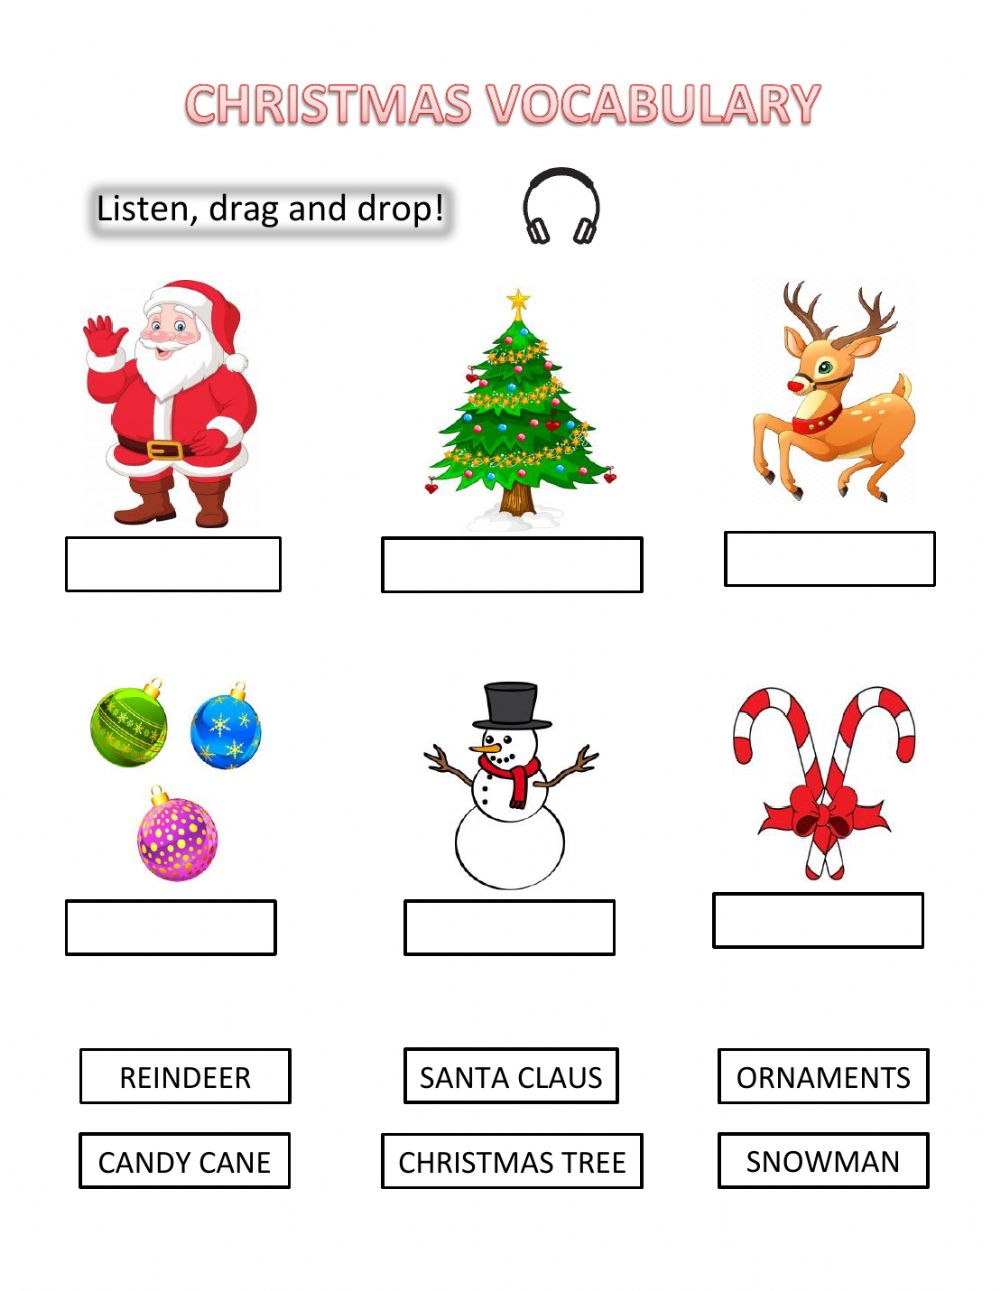 Pdf Online Exercise: Christmas Vocabulary